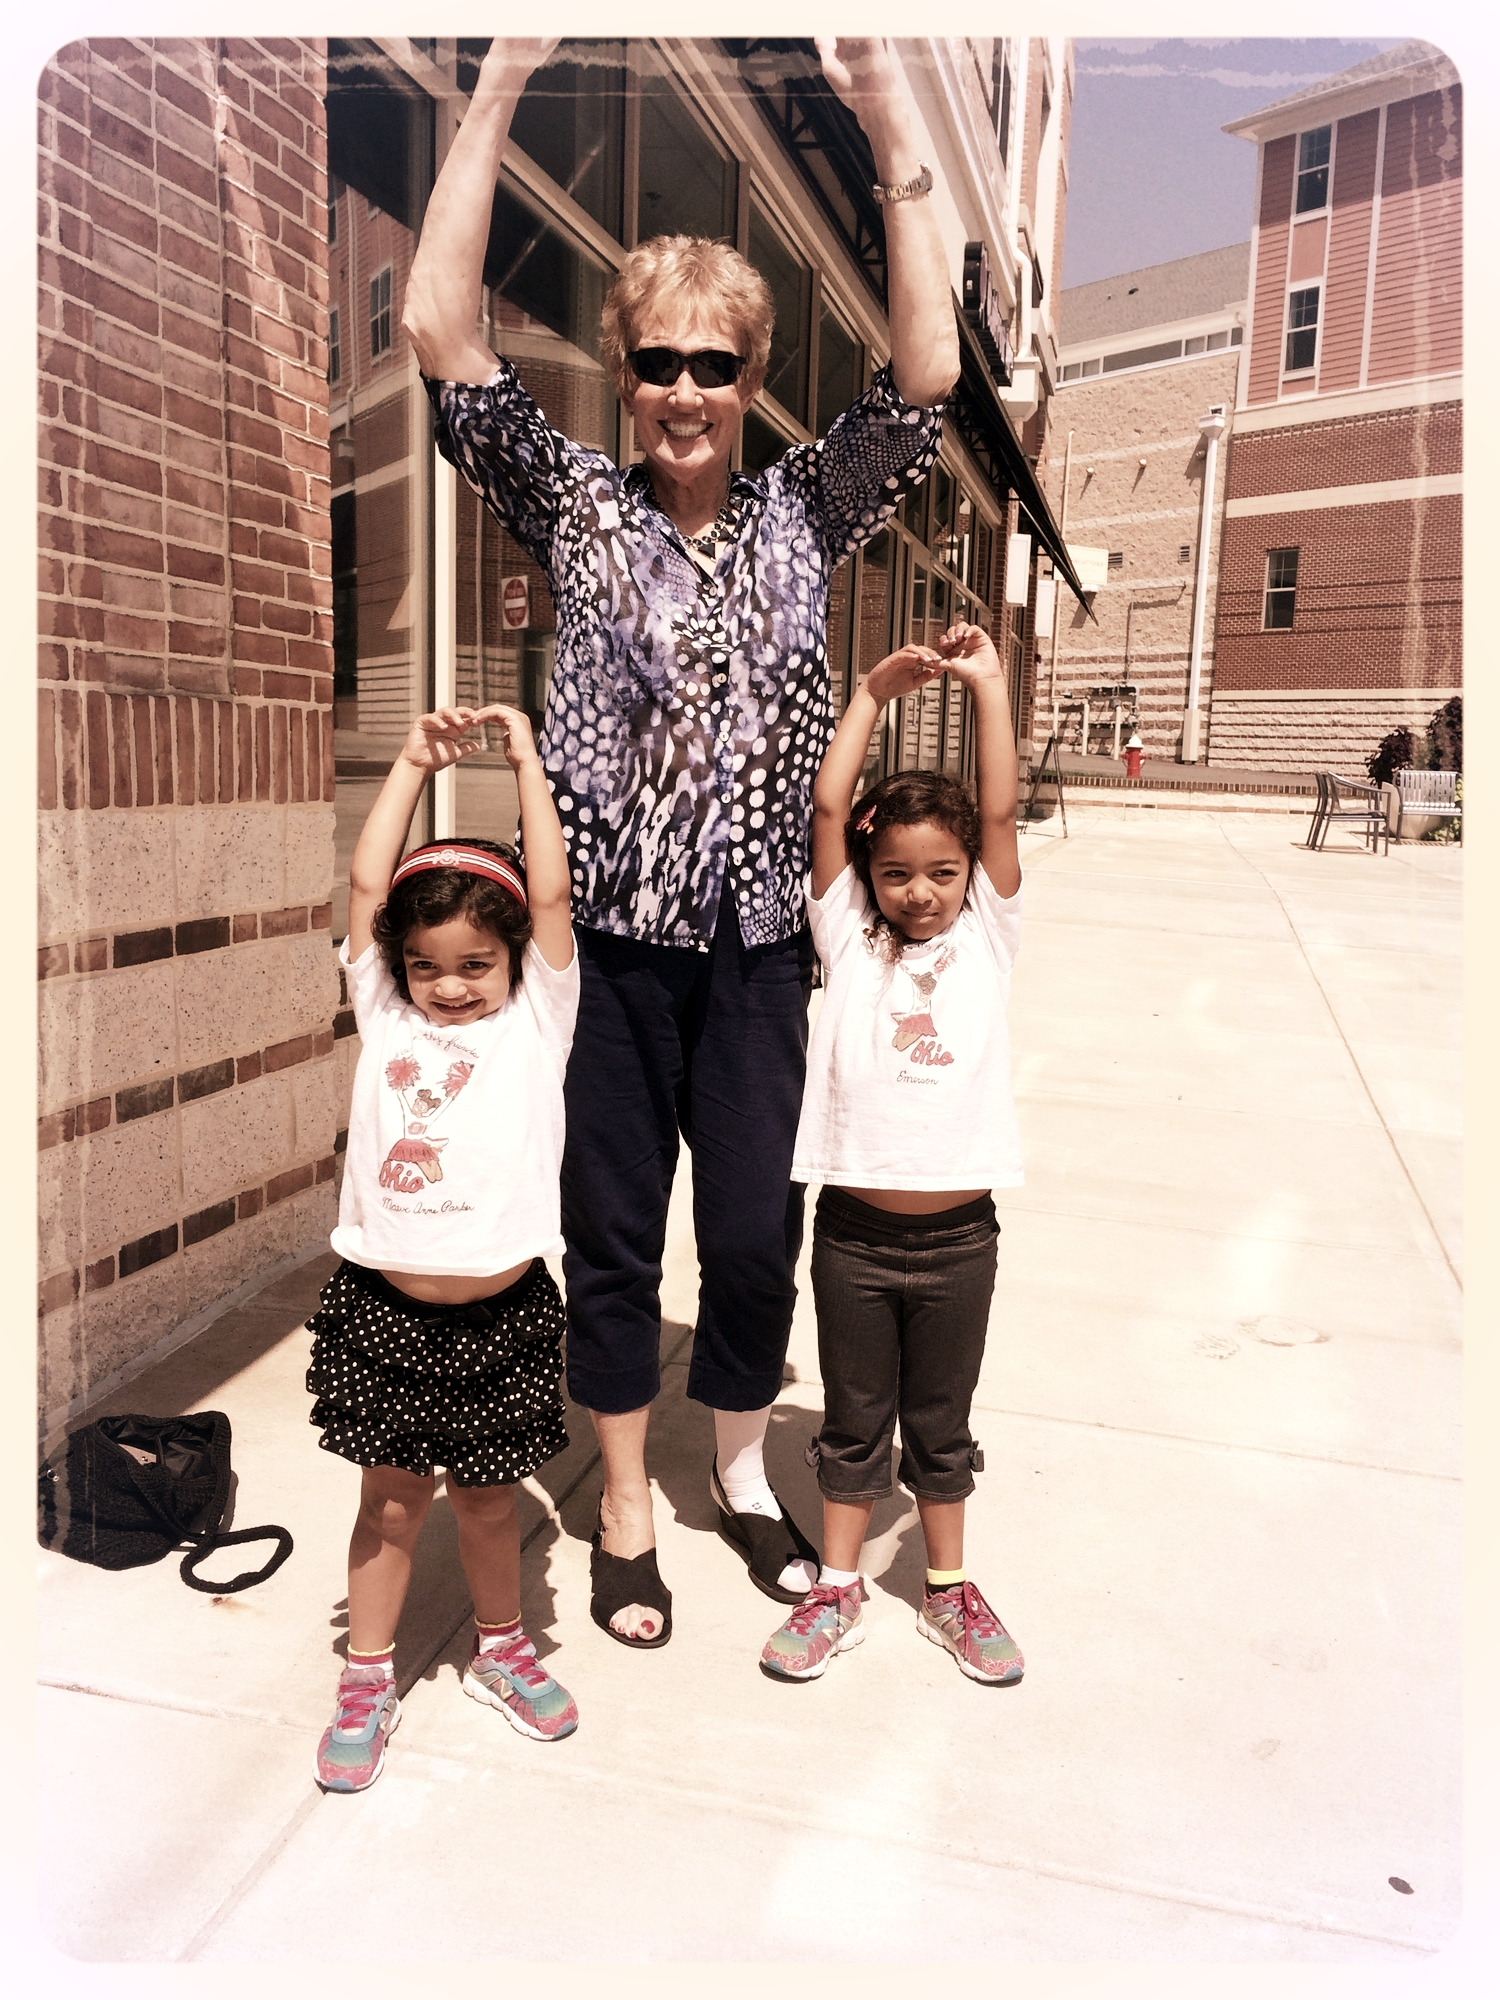 Jane Fawcett-Hoover had a blast sharing her Buckeye memories with my daughters.